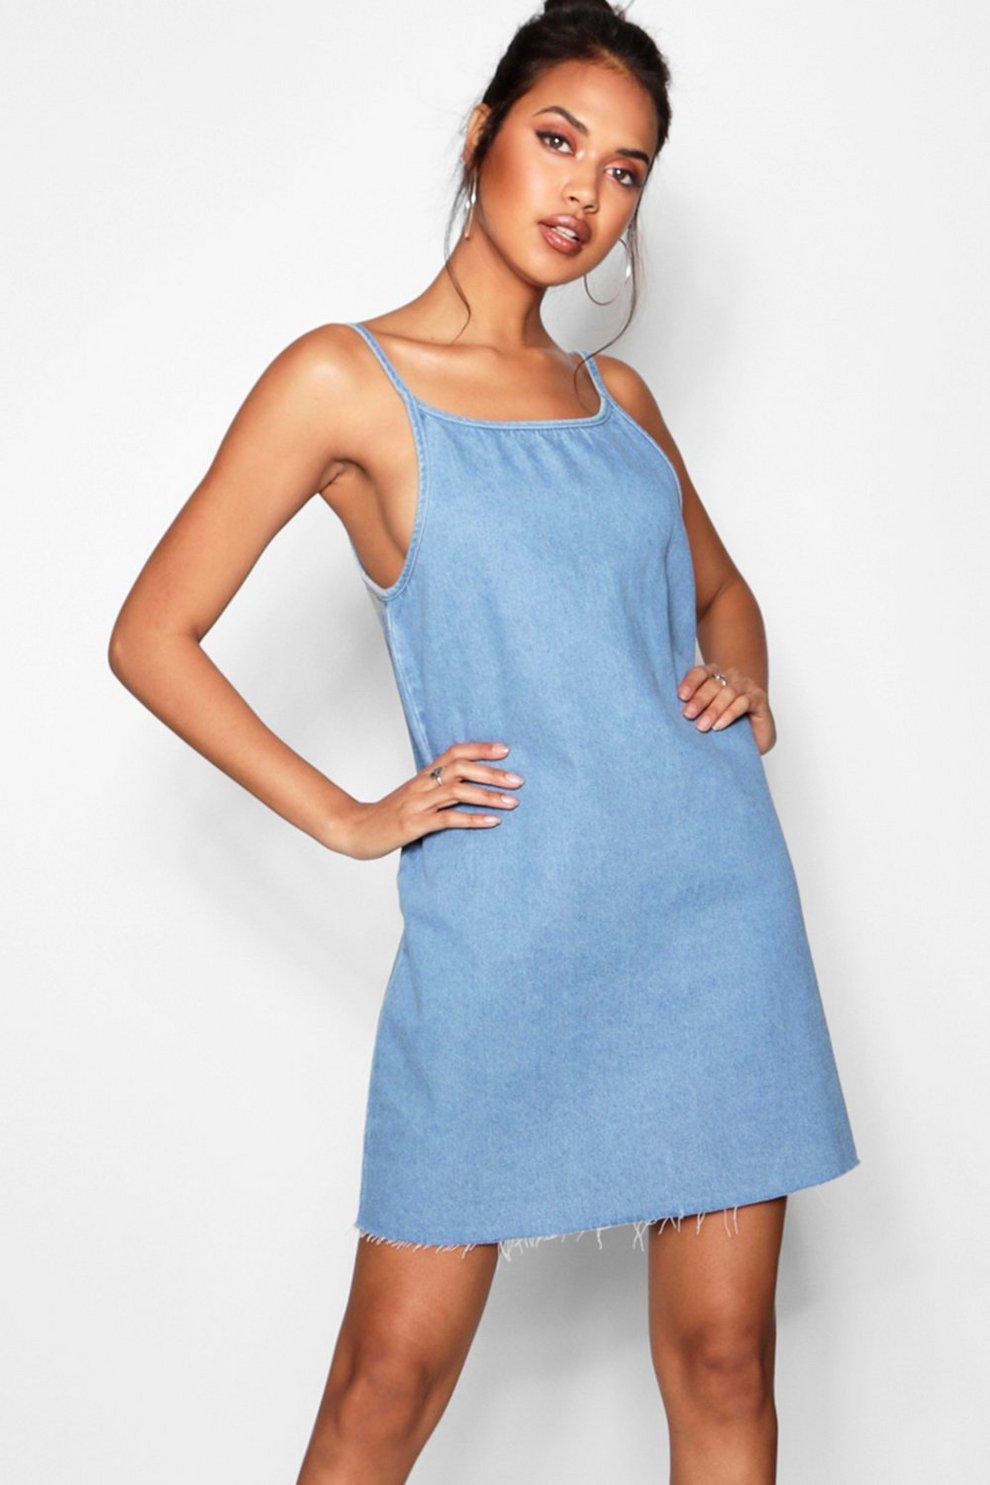 5170c4a202c63 Loose Low Back Strappy Denim Dress | Boohoo